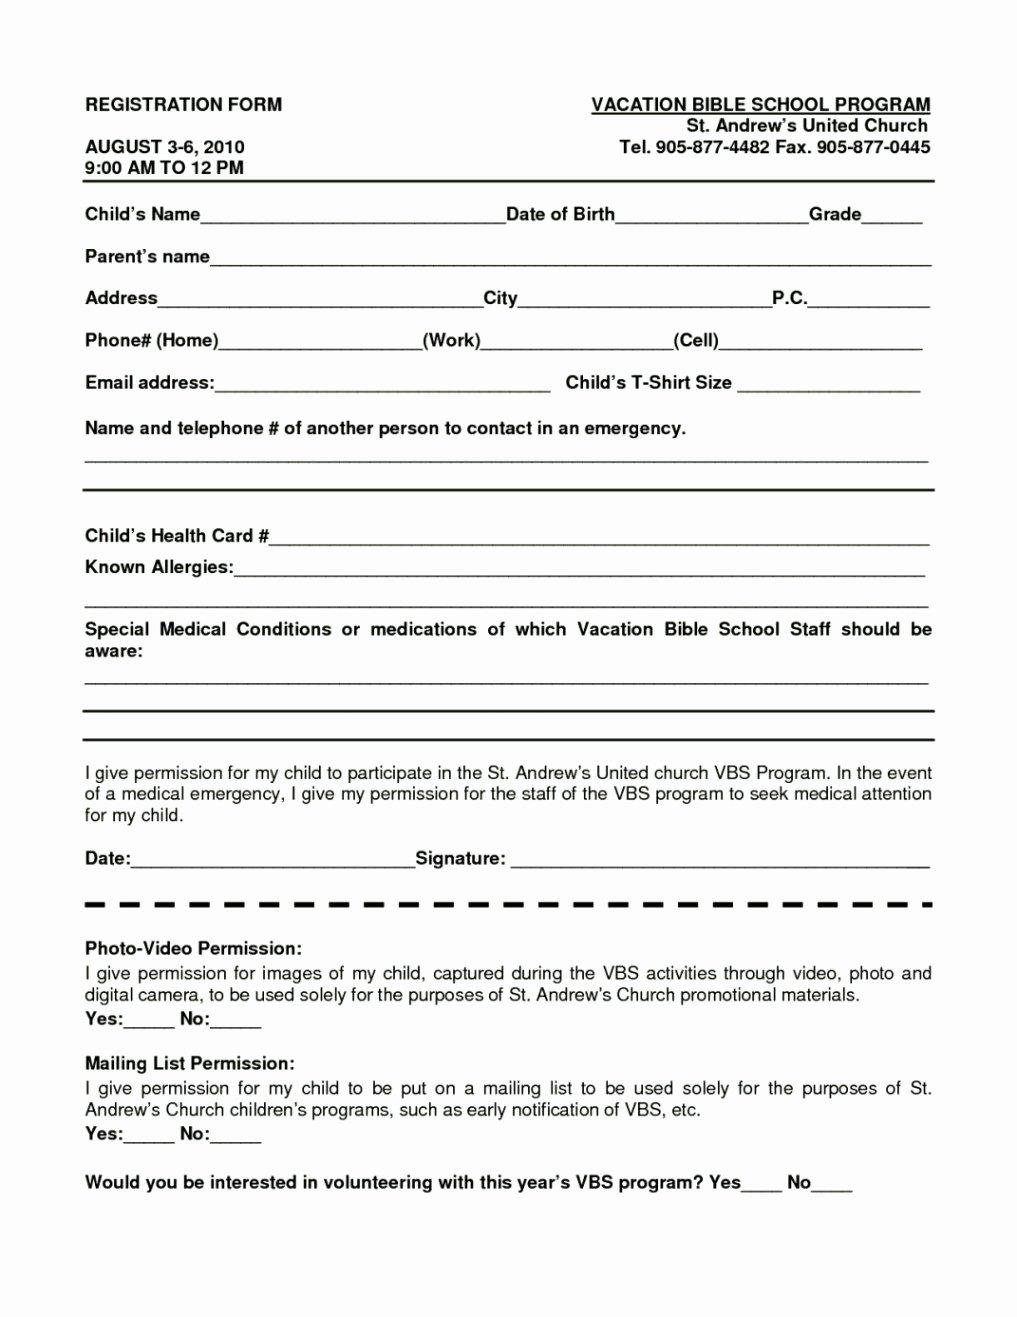 School Registration form Template Beautiful Bible School Registration form Template Template